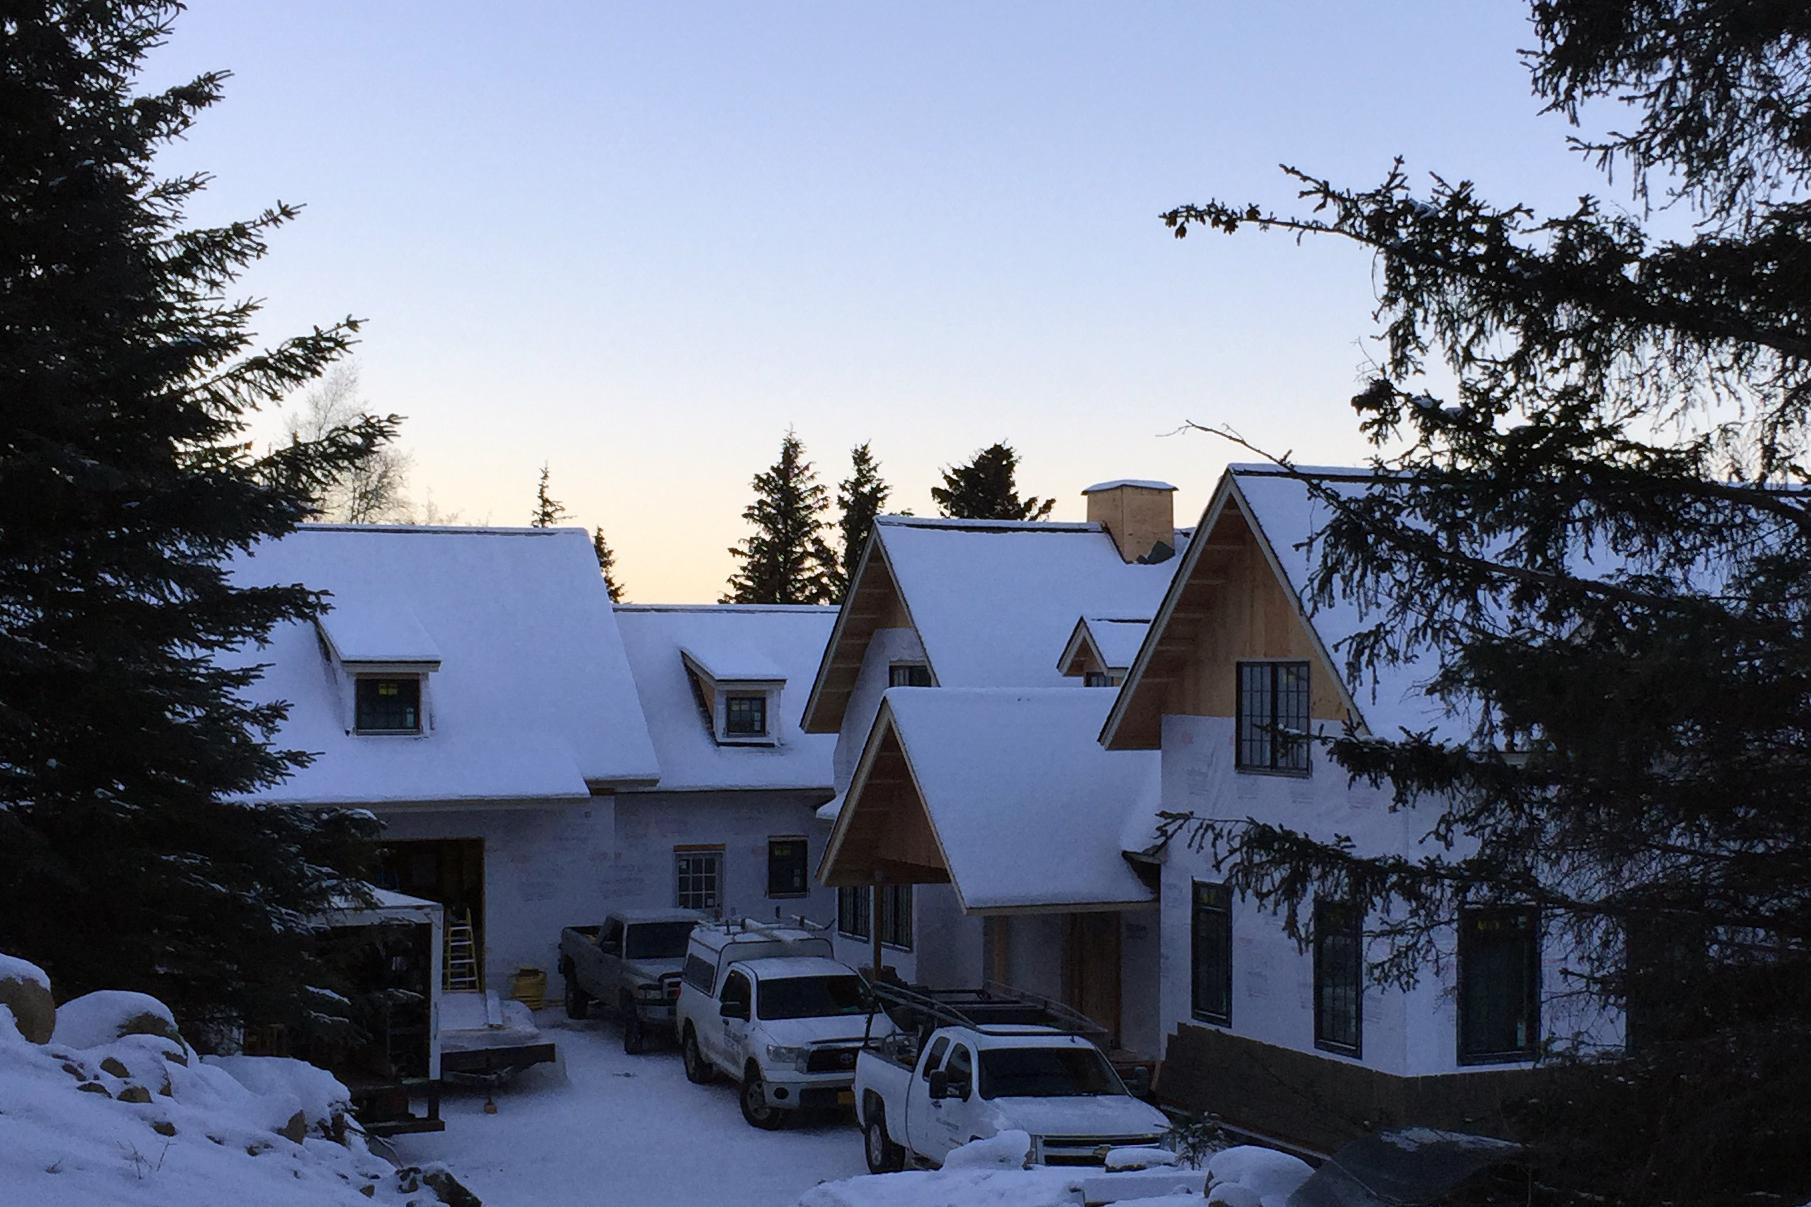 AlaskaFarmhouse 12-12-2016 (5).jpg